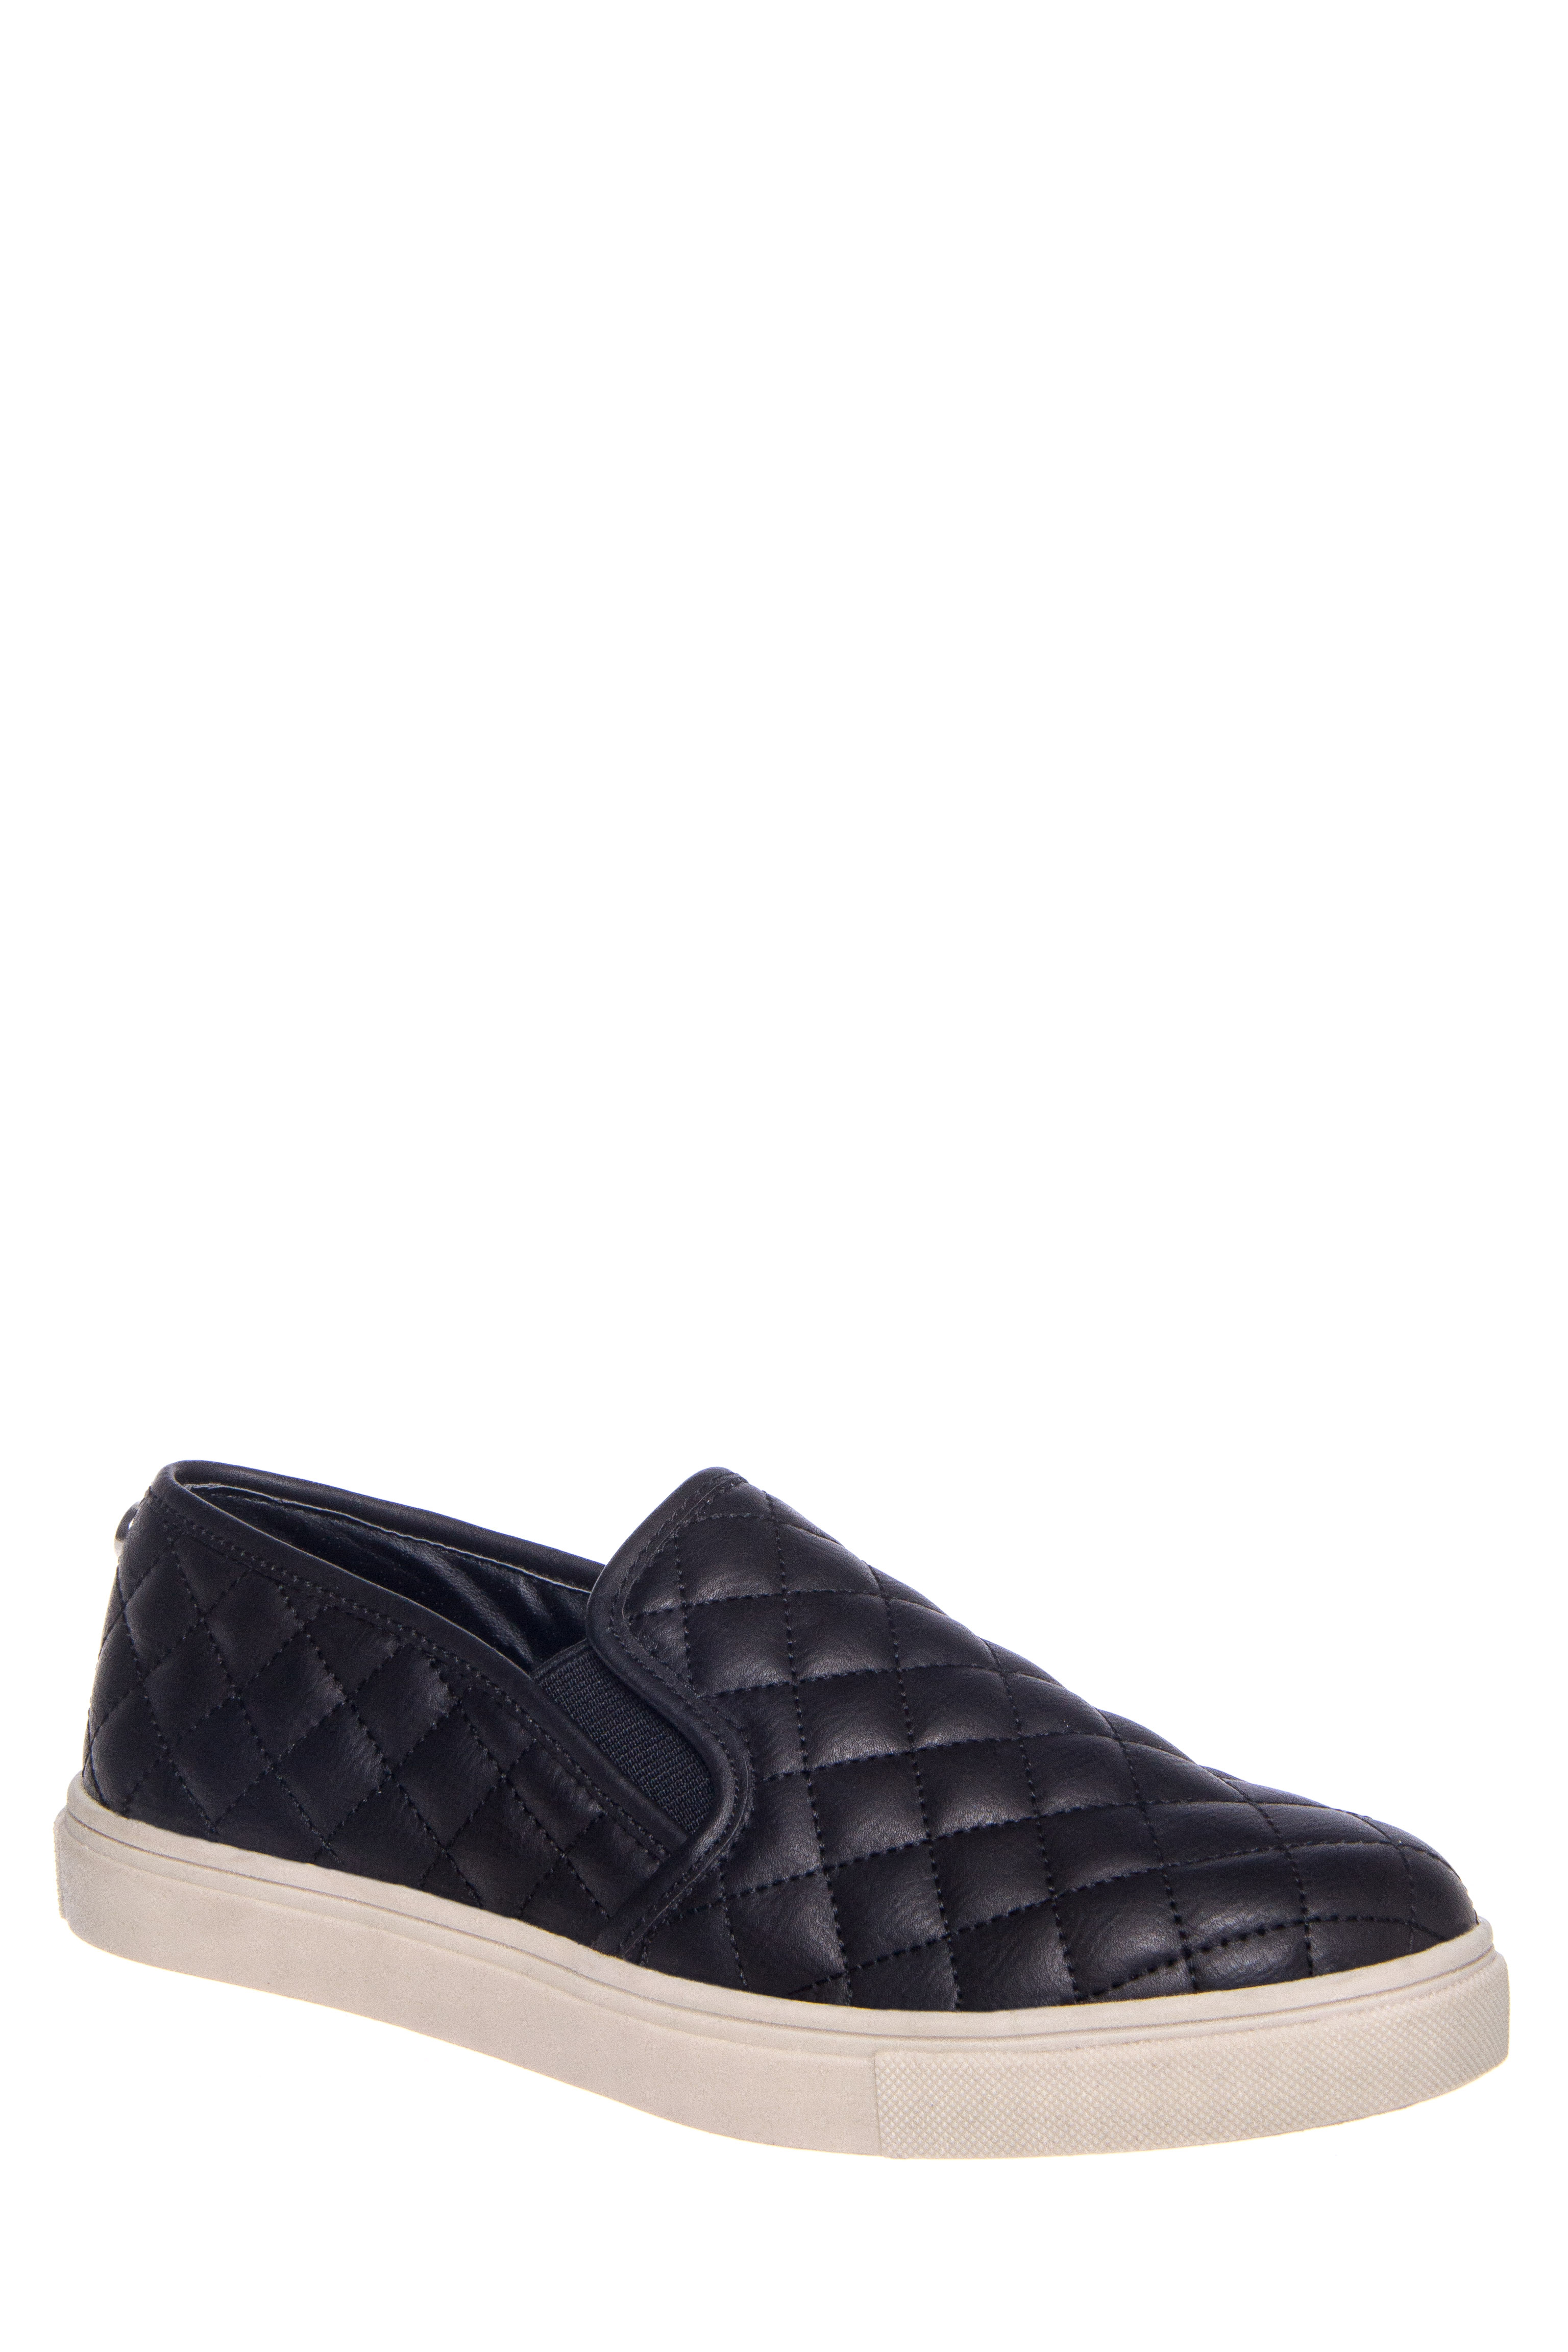 Steve Madden Ecentrcq Slip On Platform Sneakers